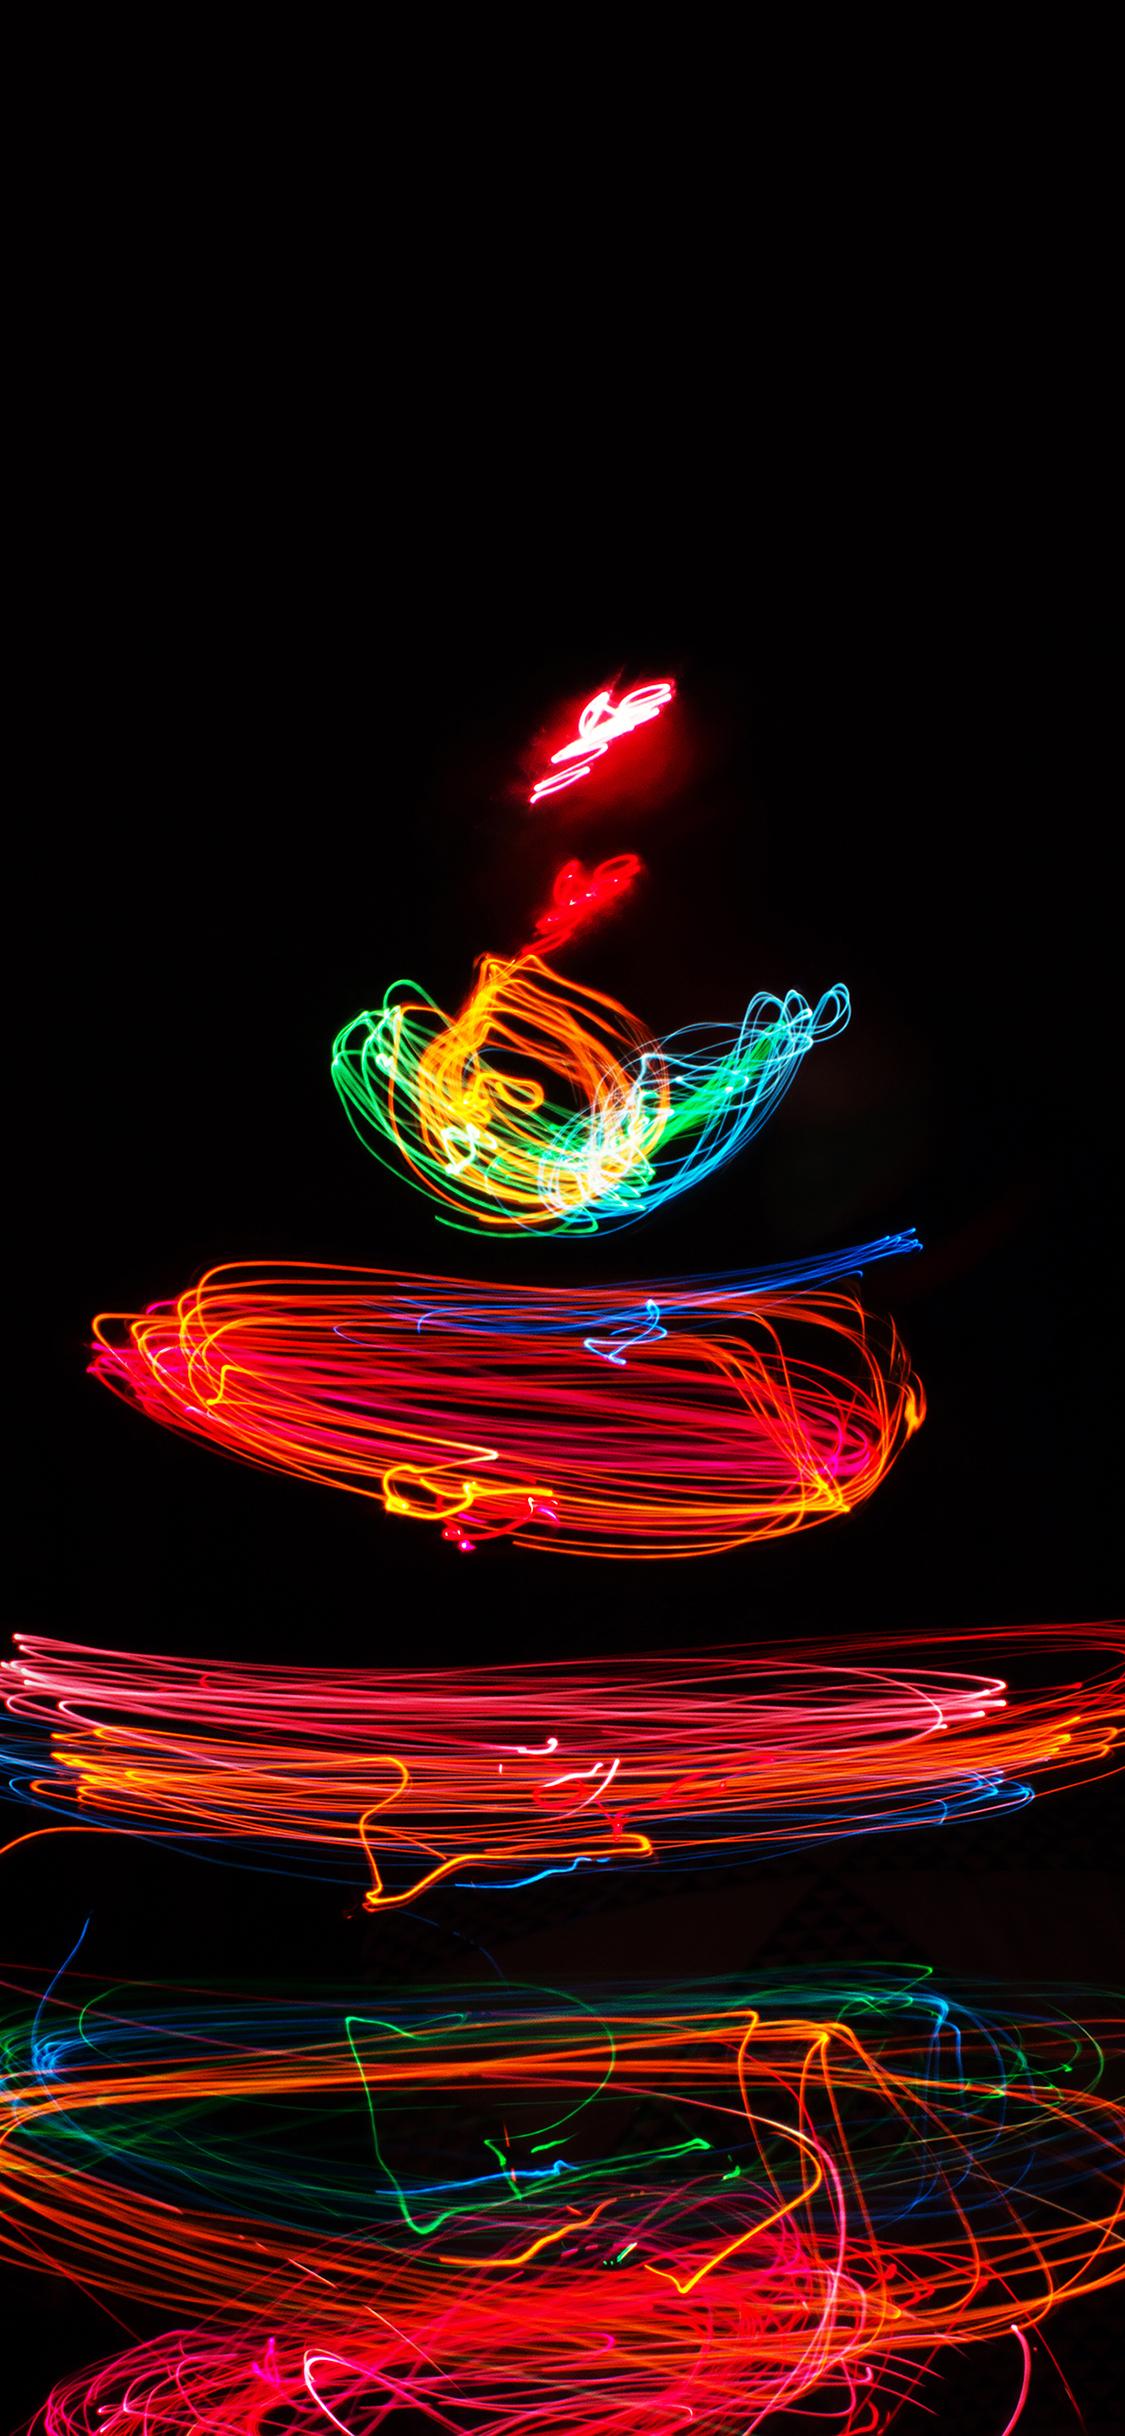 Iphonepapers Mj47 Christmas Tree Happy Lights Art Bokeh